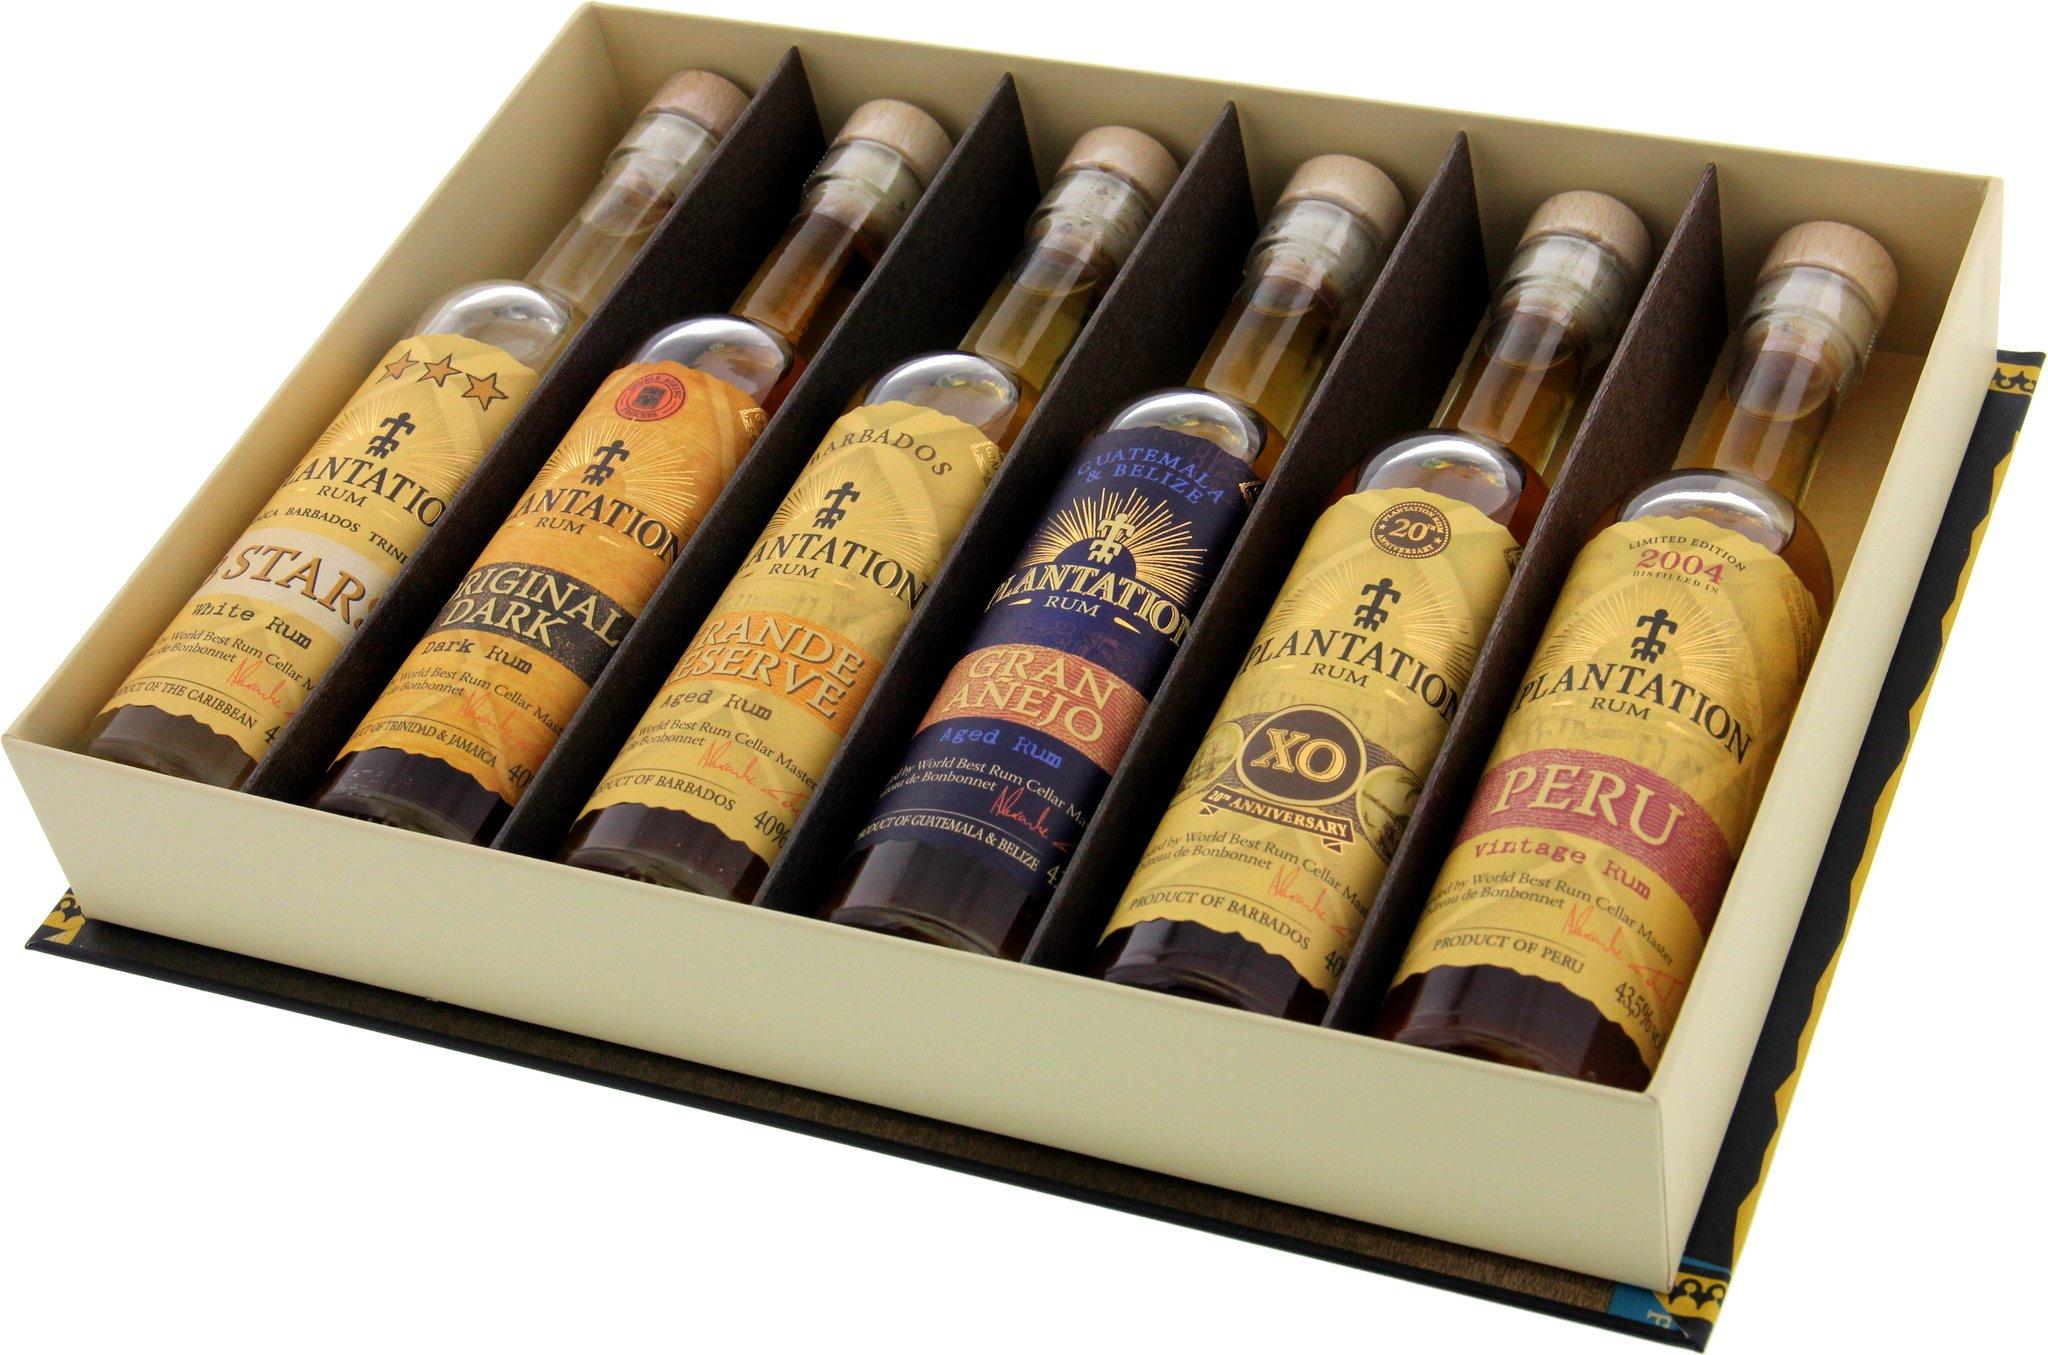 Plantation Rum Experience Artisanal Rum 6er Set ...